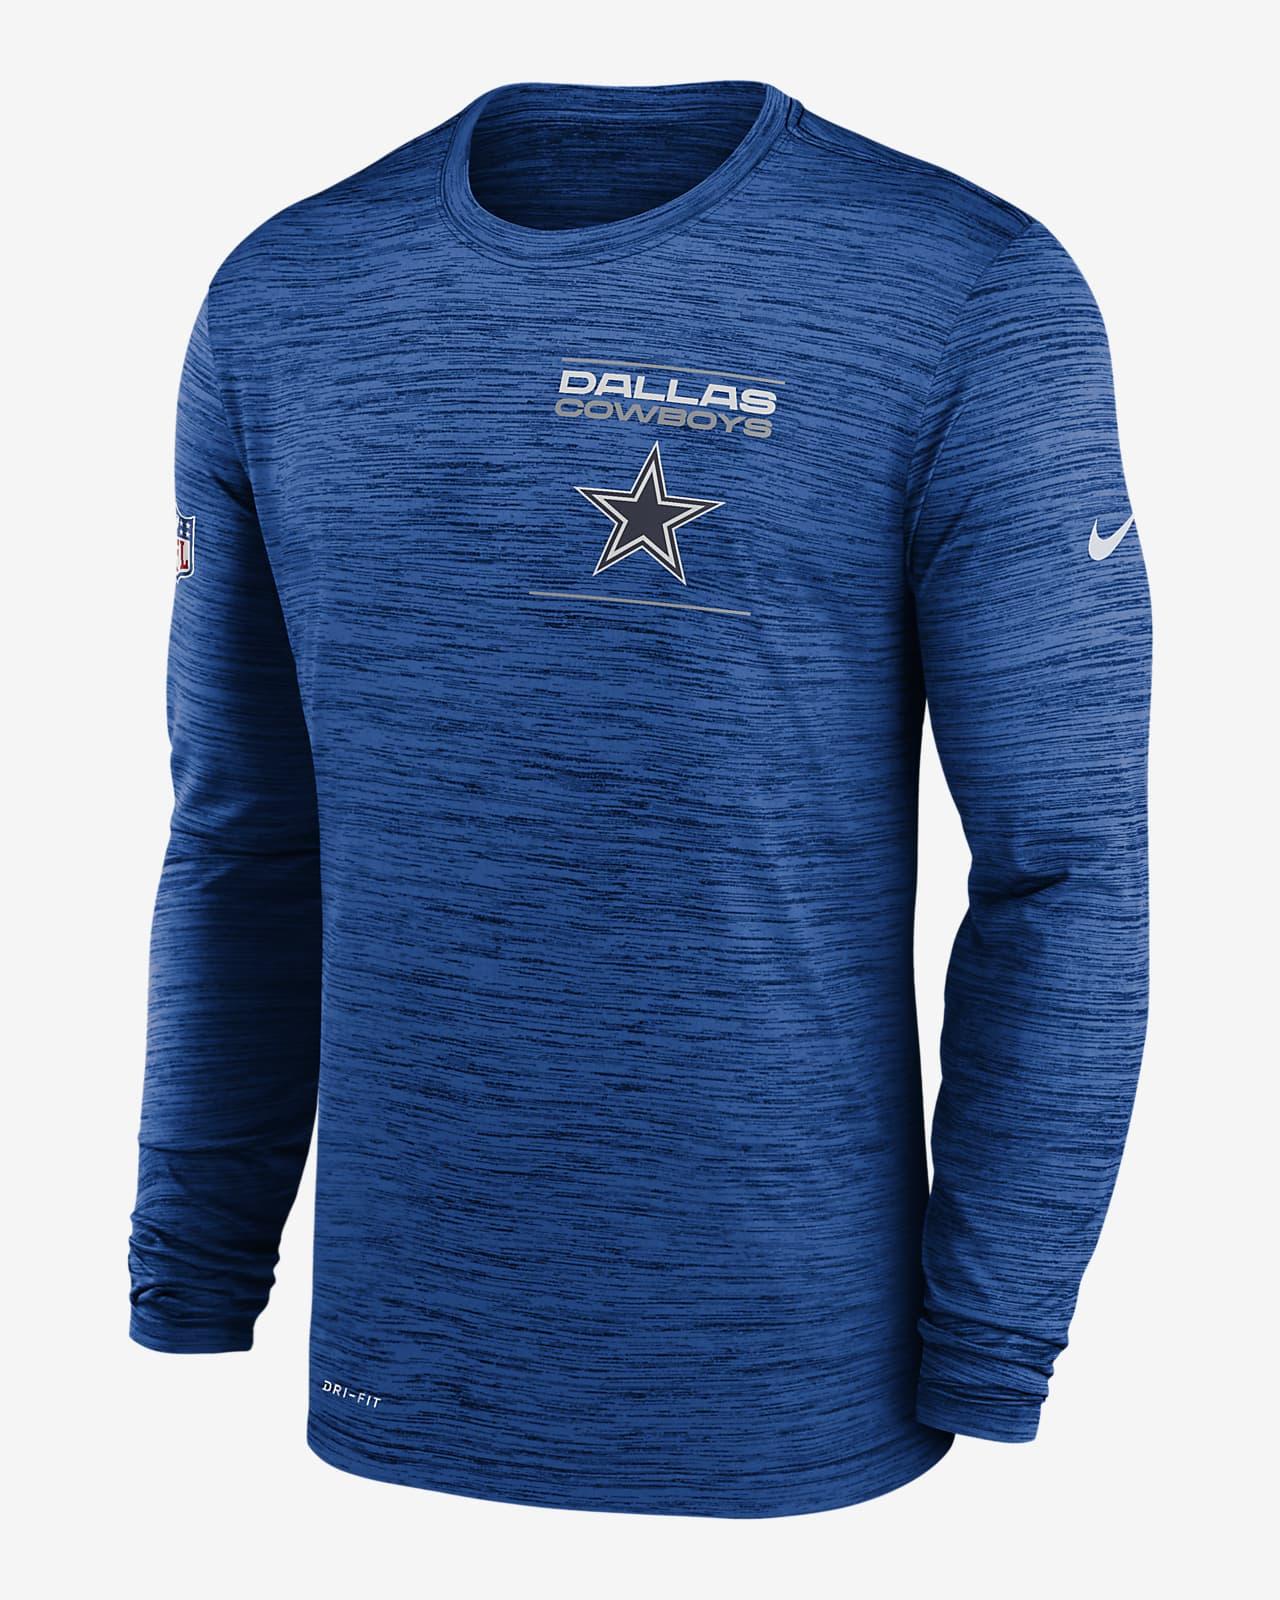 Nike Dri-FIT Sideline Velocity Legend (NFL Dallas Cowboys) Men's Long-Sleeve T-Shirt